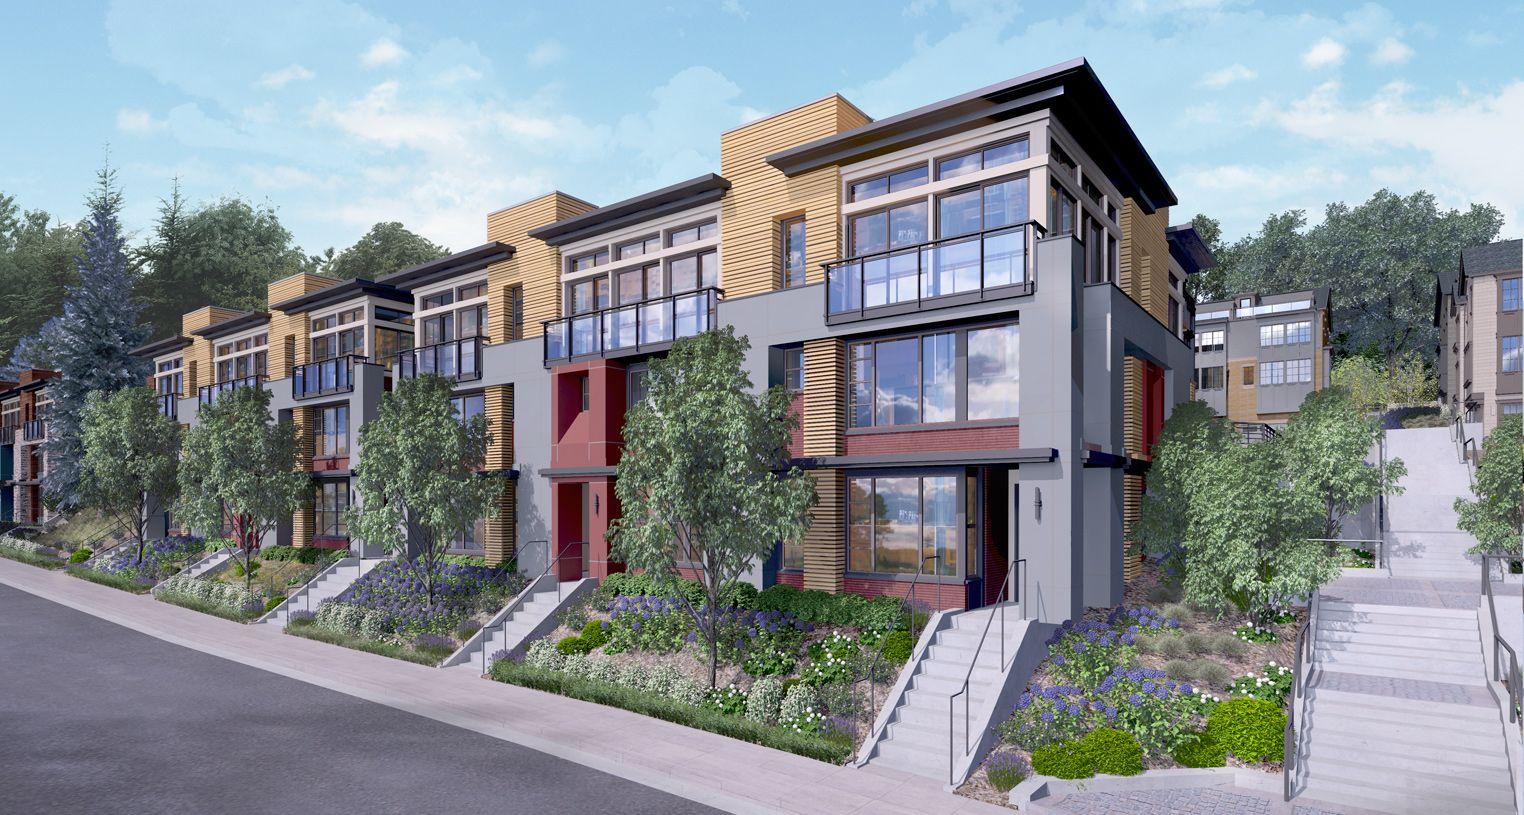 Multi Family for Sale at Prospect Elite 2150 10th Ave W Seattle, Washington 98119 United States